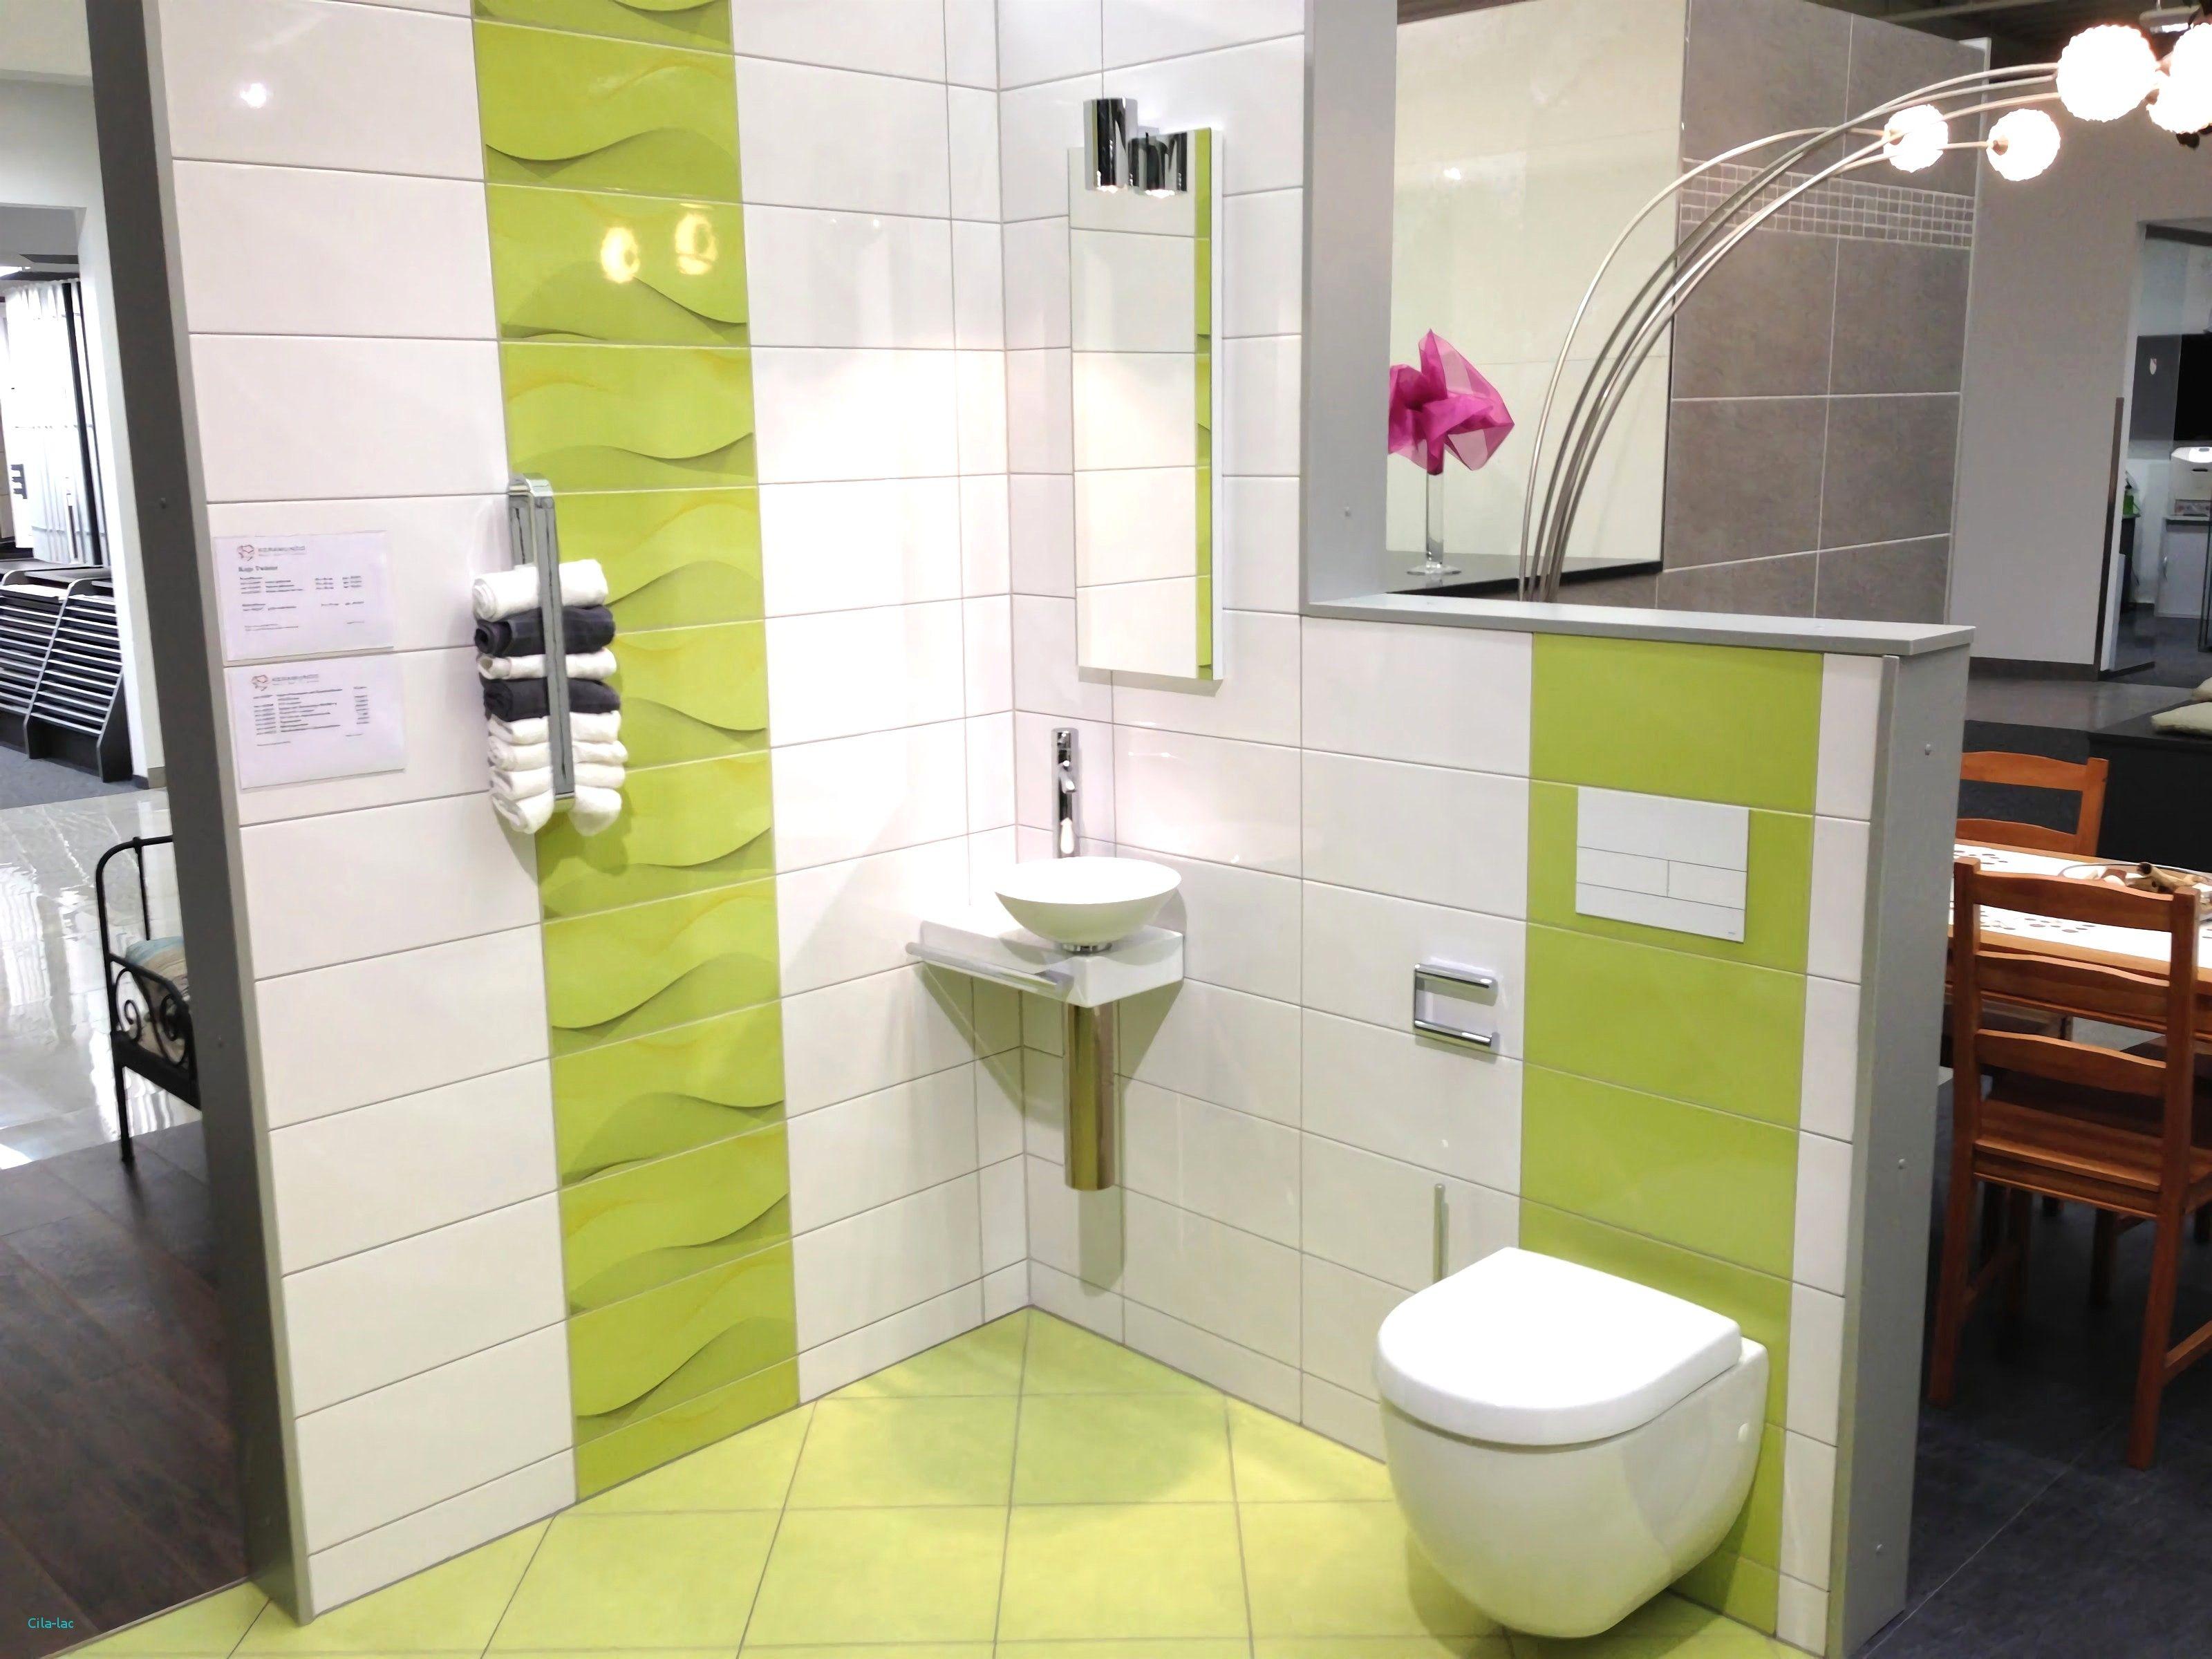 Badezimmer Fliesen Zwei Farben Badezimmer Pinterest Badezimmer